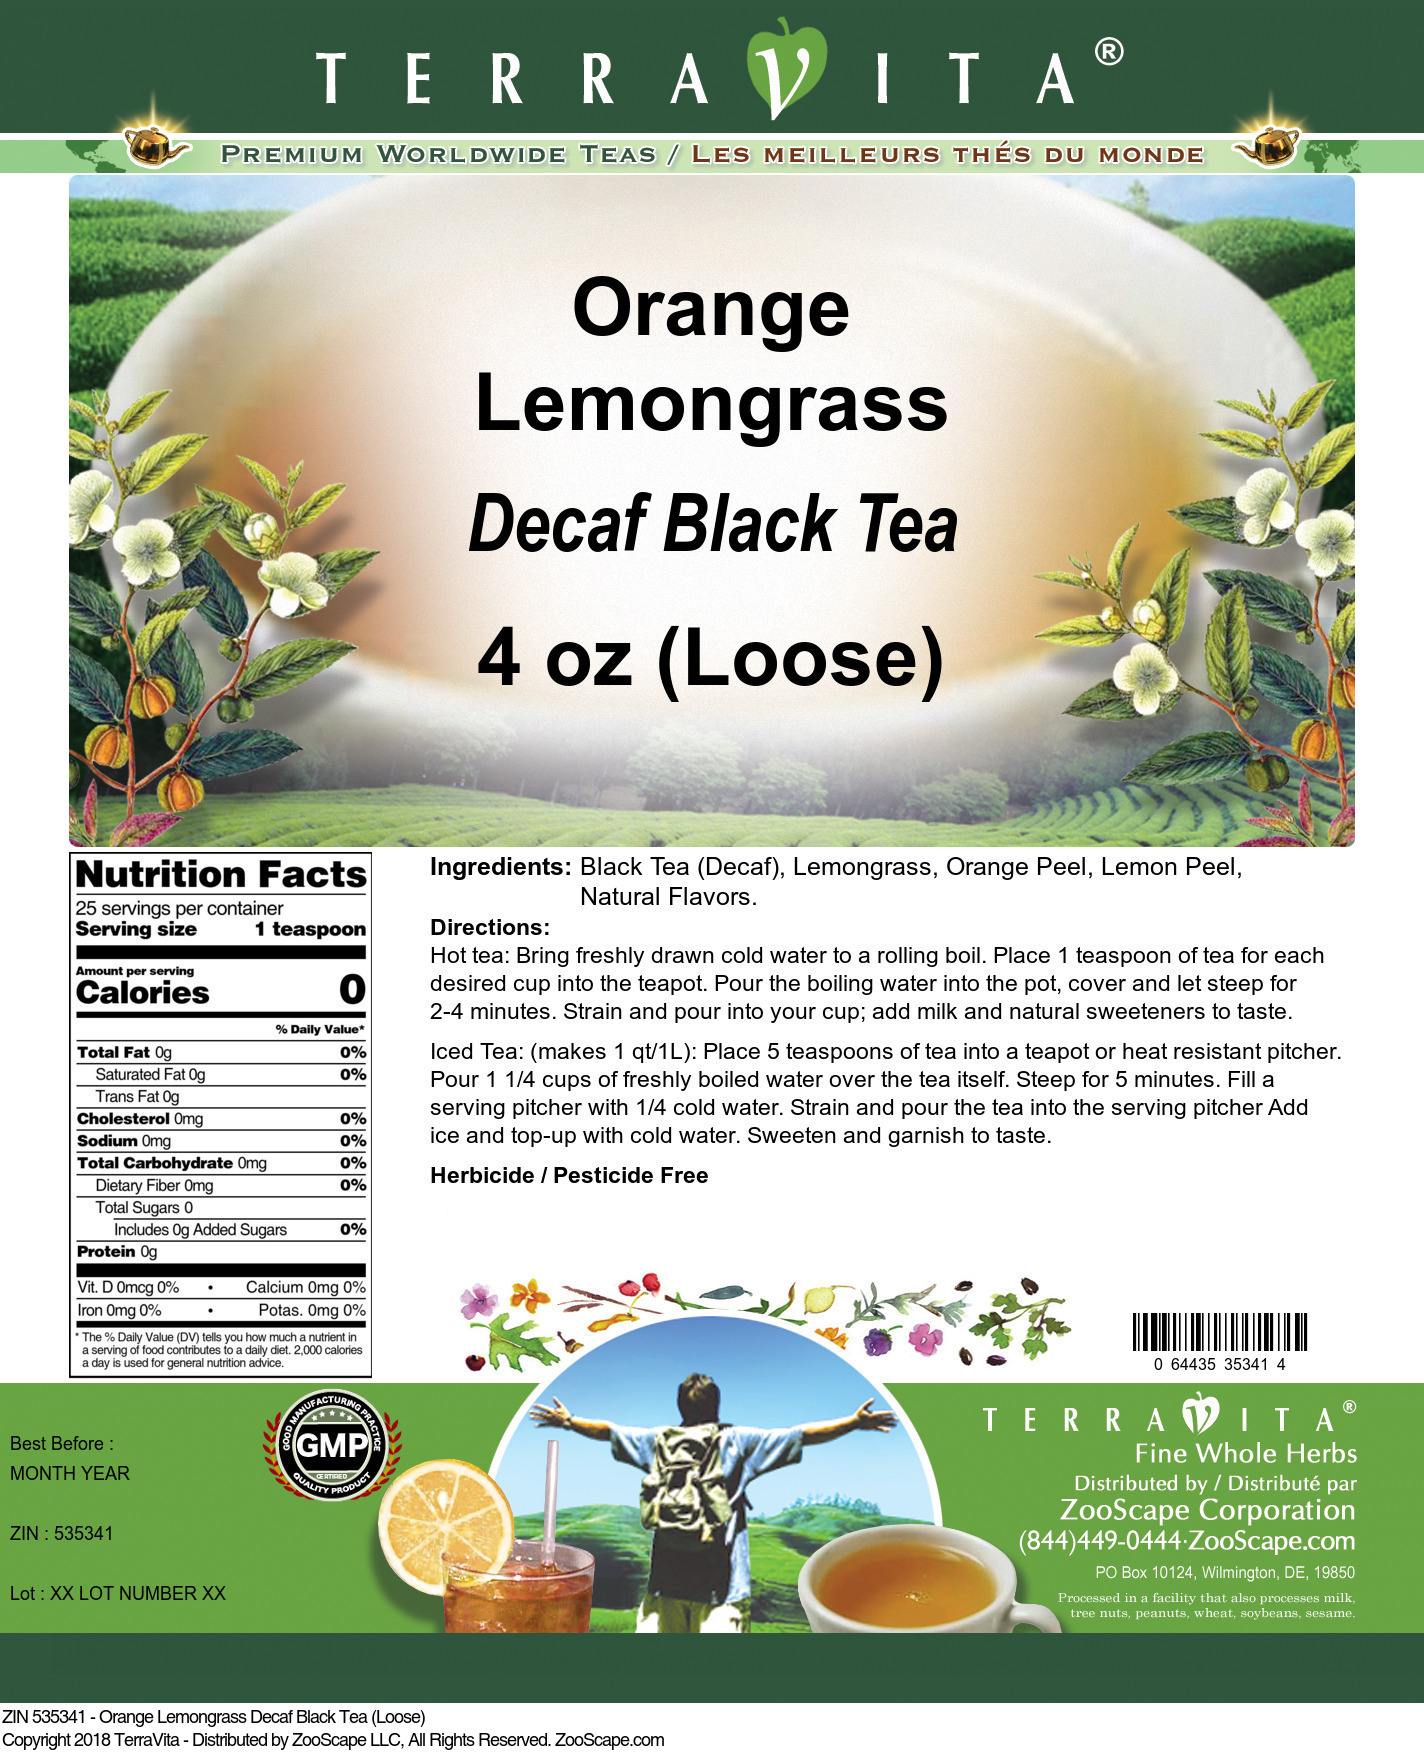 Orange Lemongrass Decaf Black Tea (Loose)